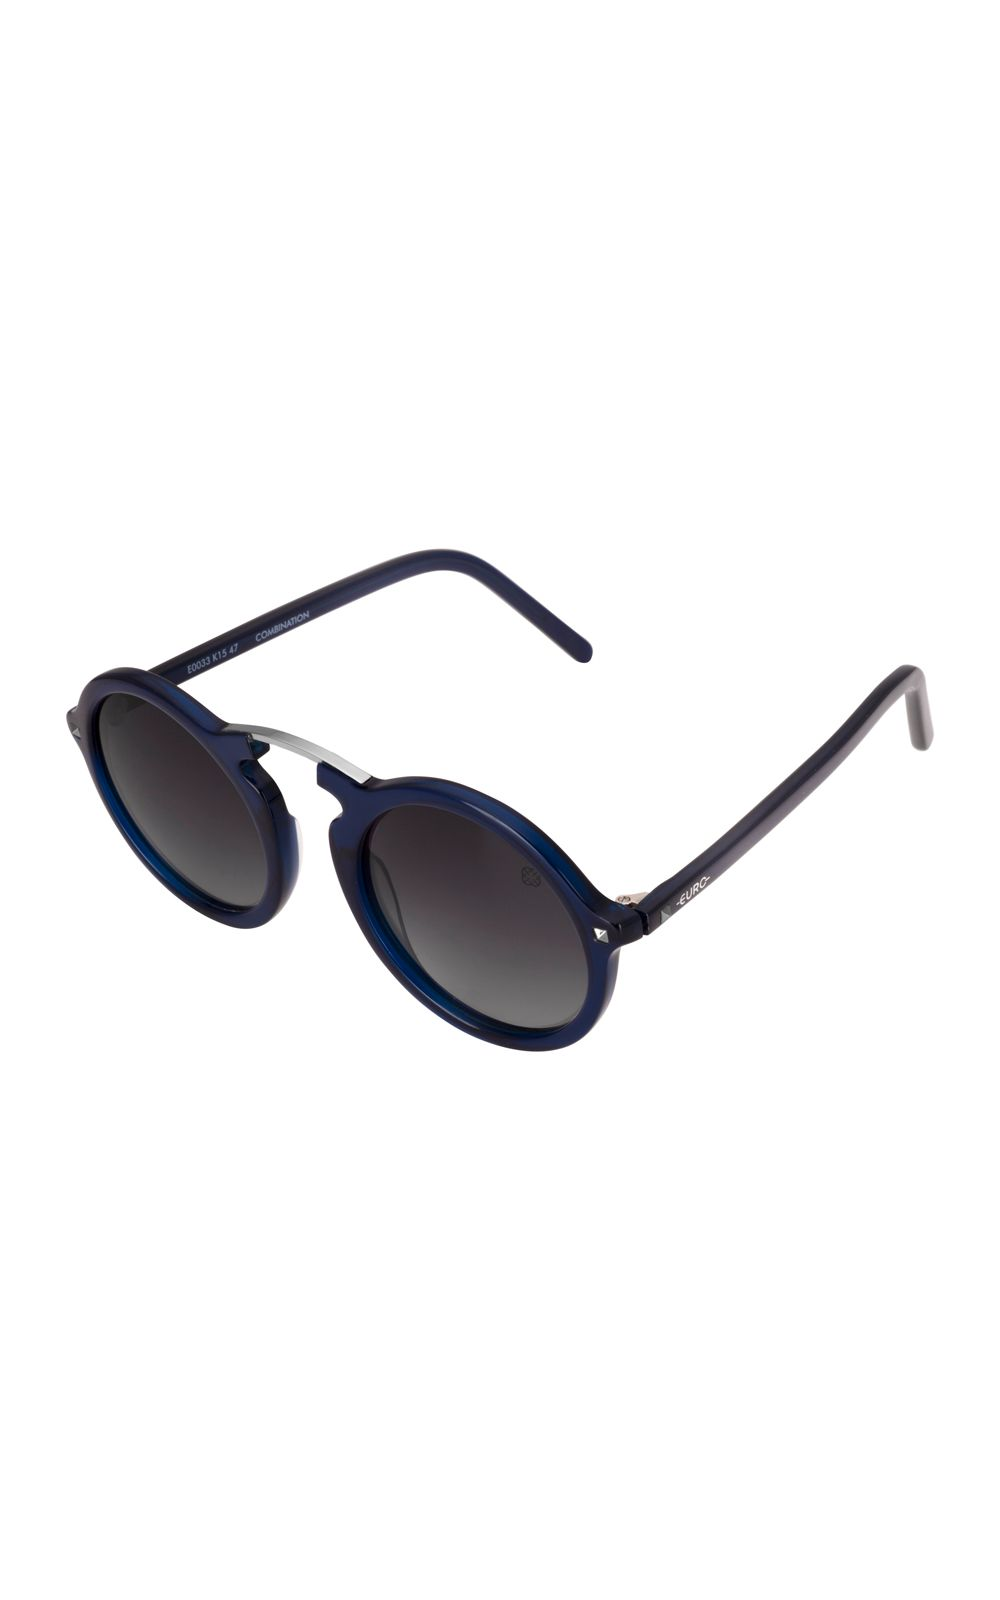 Foto 2 - Óculos Euro Casual Vintage Feminino Azul E0033K1547/8C